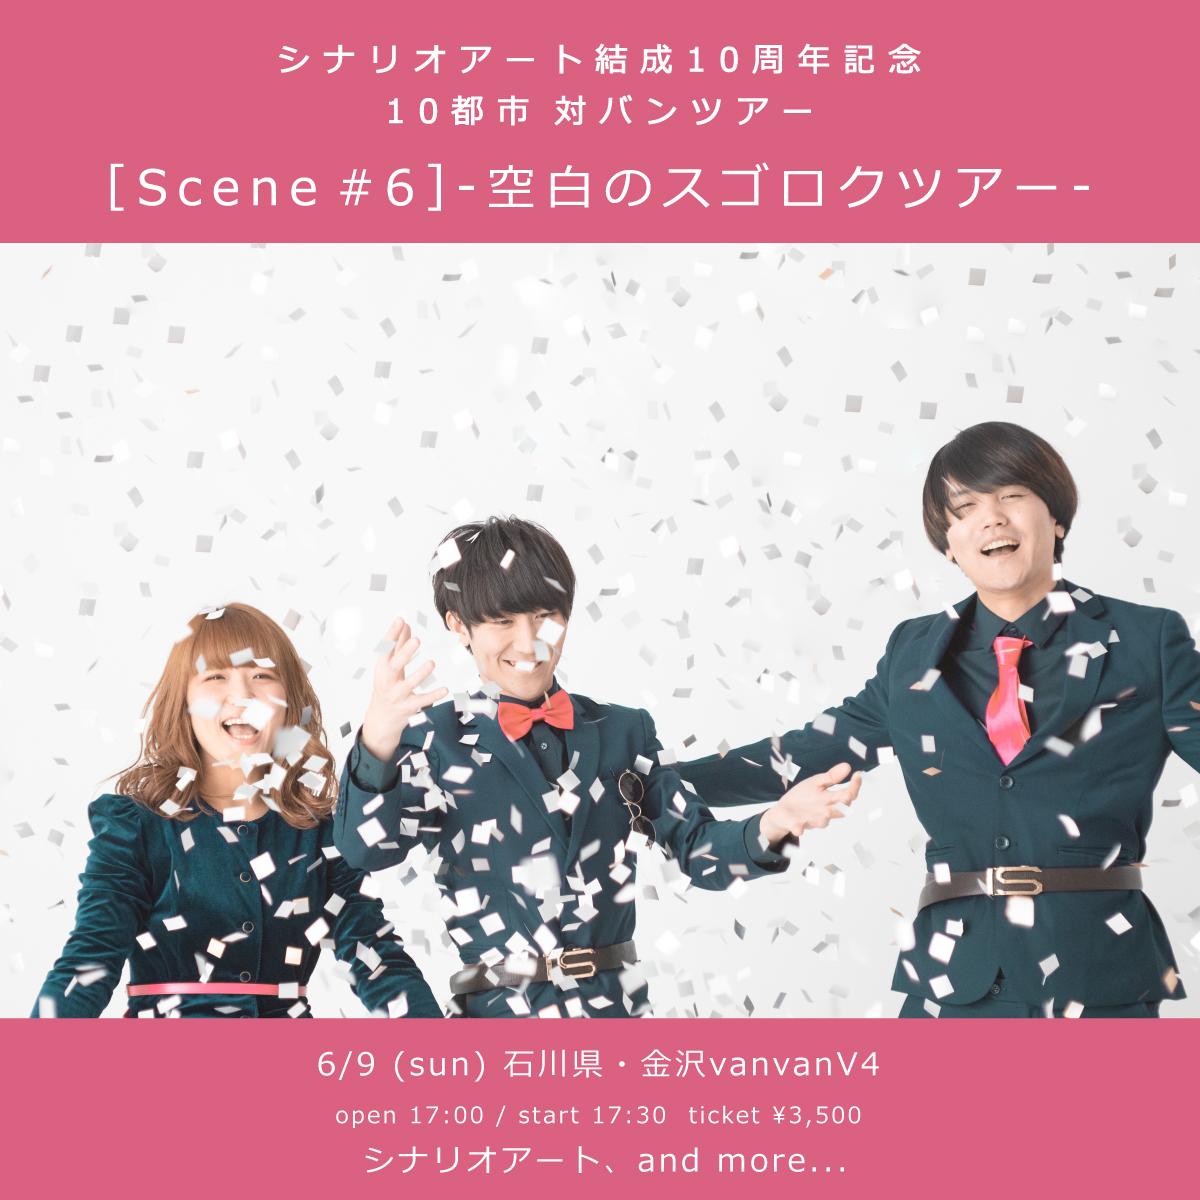 [Scene #6]-空白のスゴロクツアー- 《金沢公演》